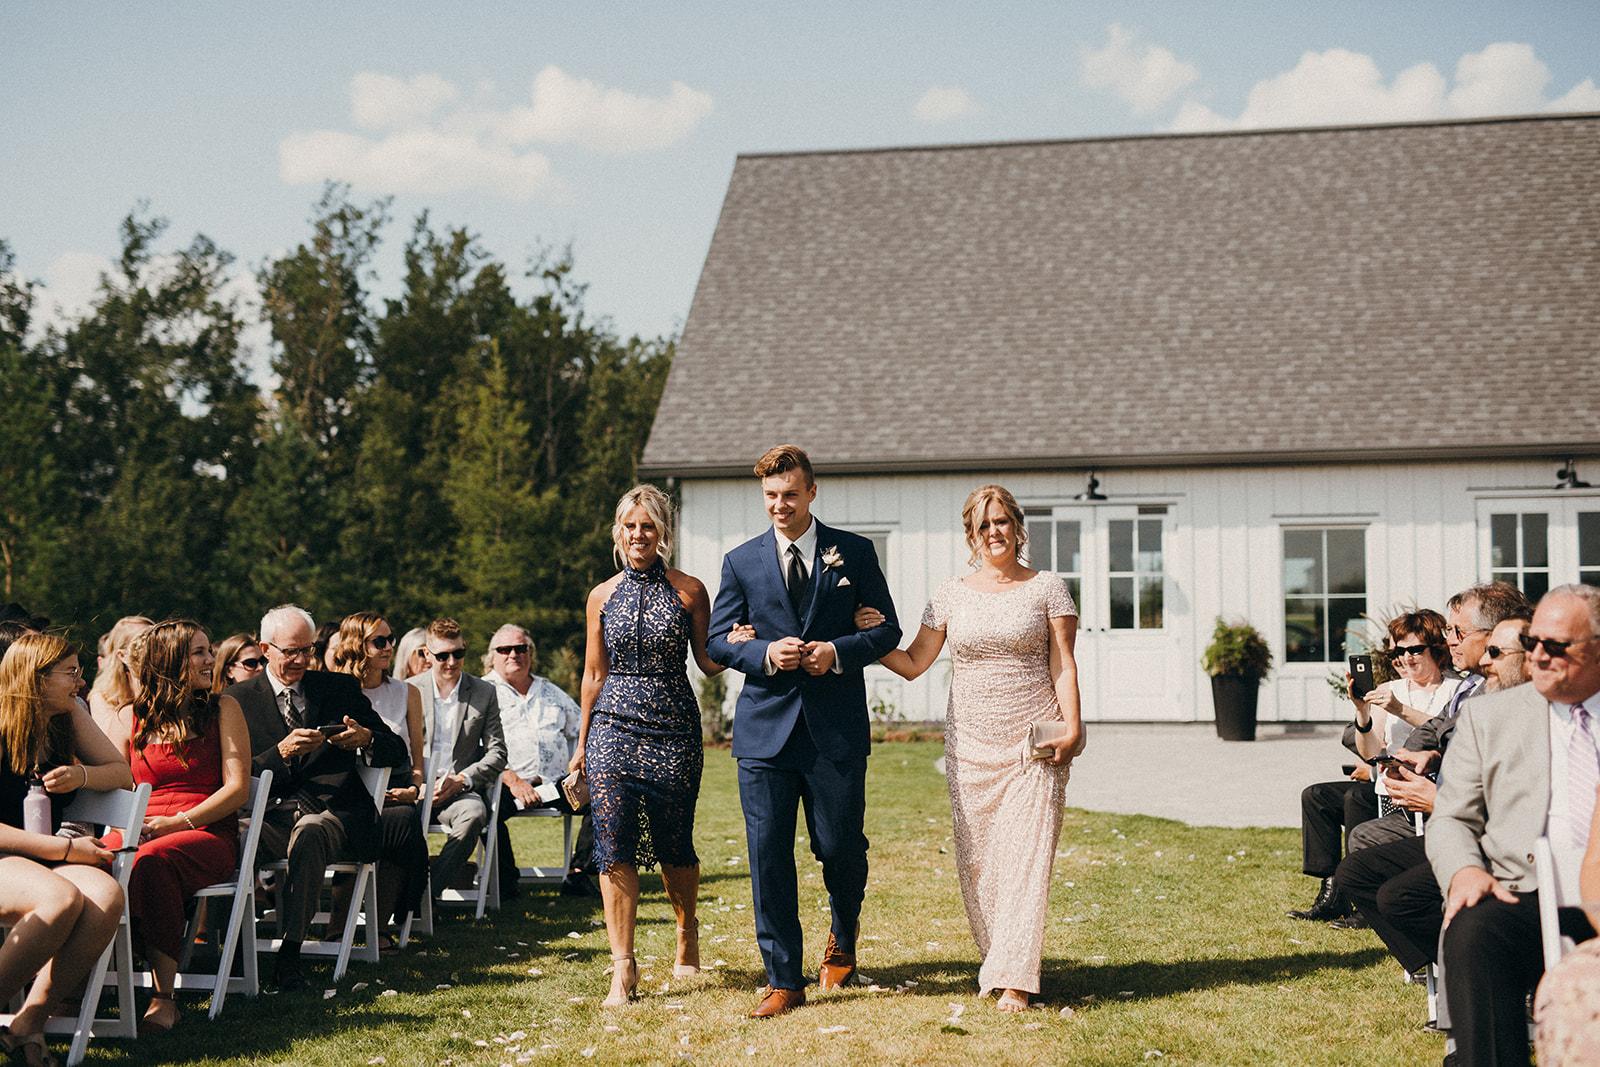 kaden_justine_wedding_1061.jpg